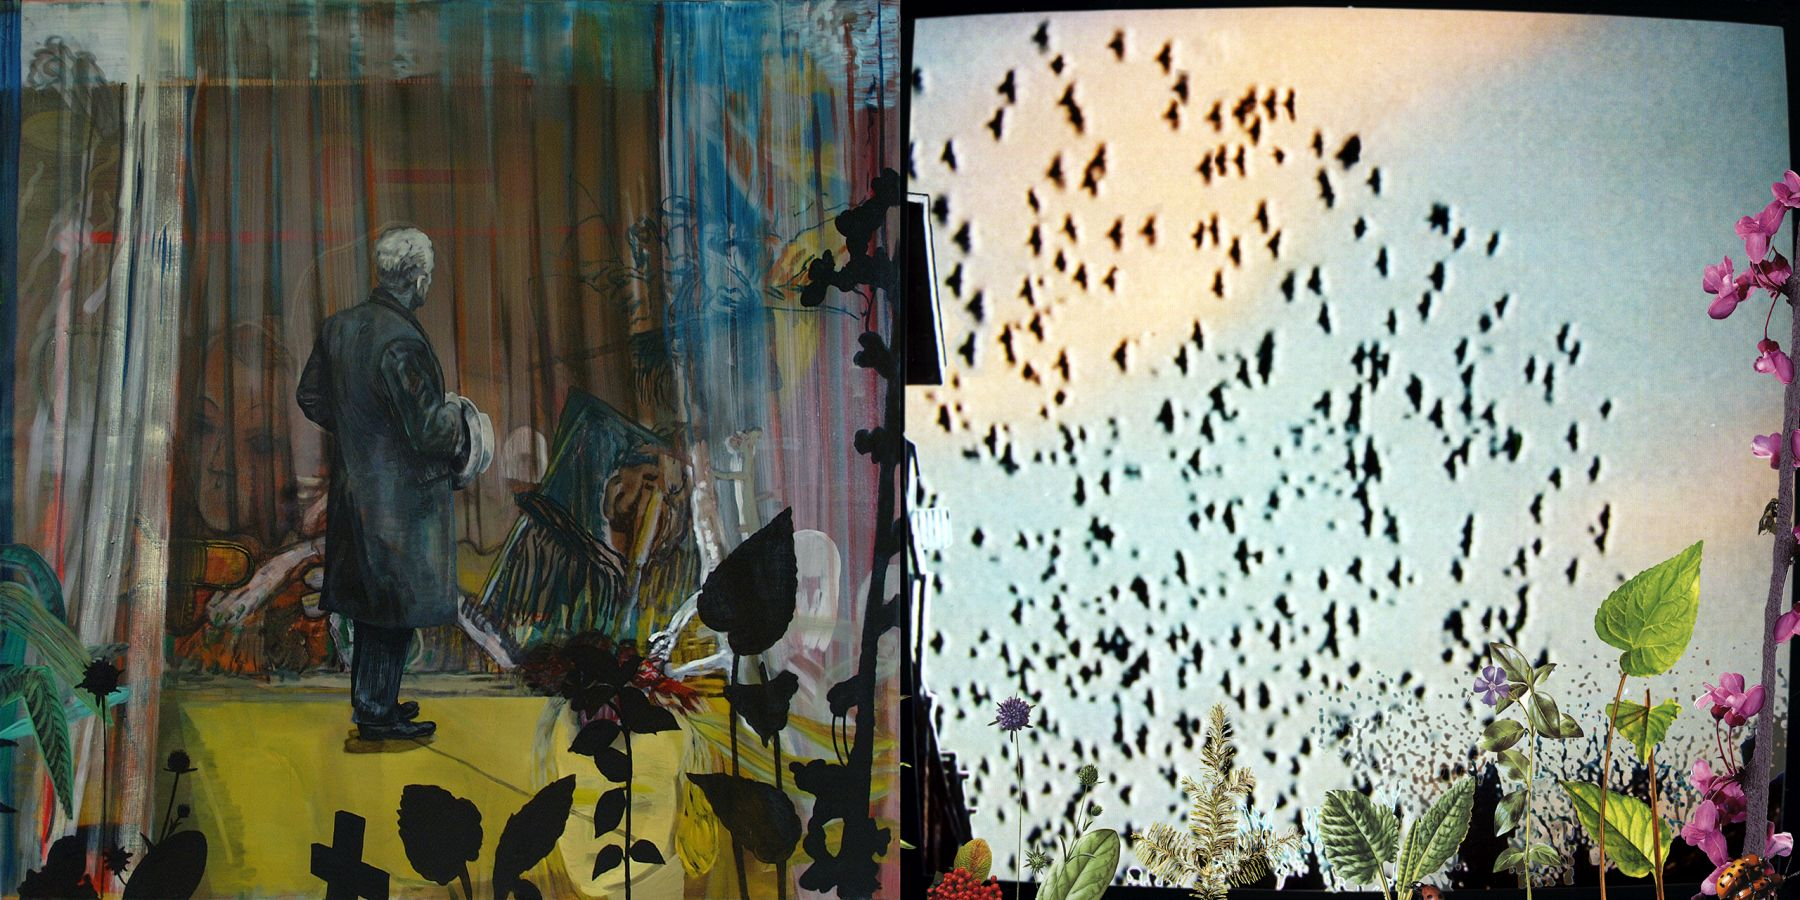 20. The Departure, 2002-2004, acrylic/oil/print/canvas, 200 x 400 cm